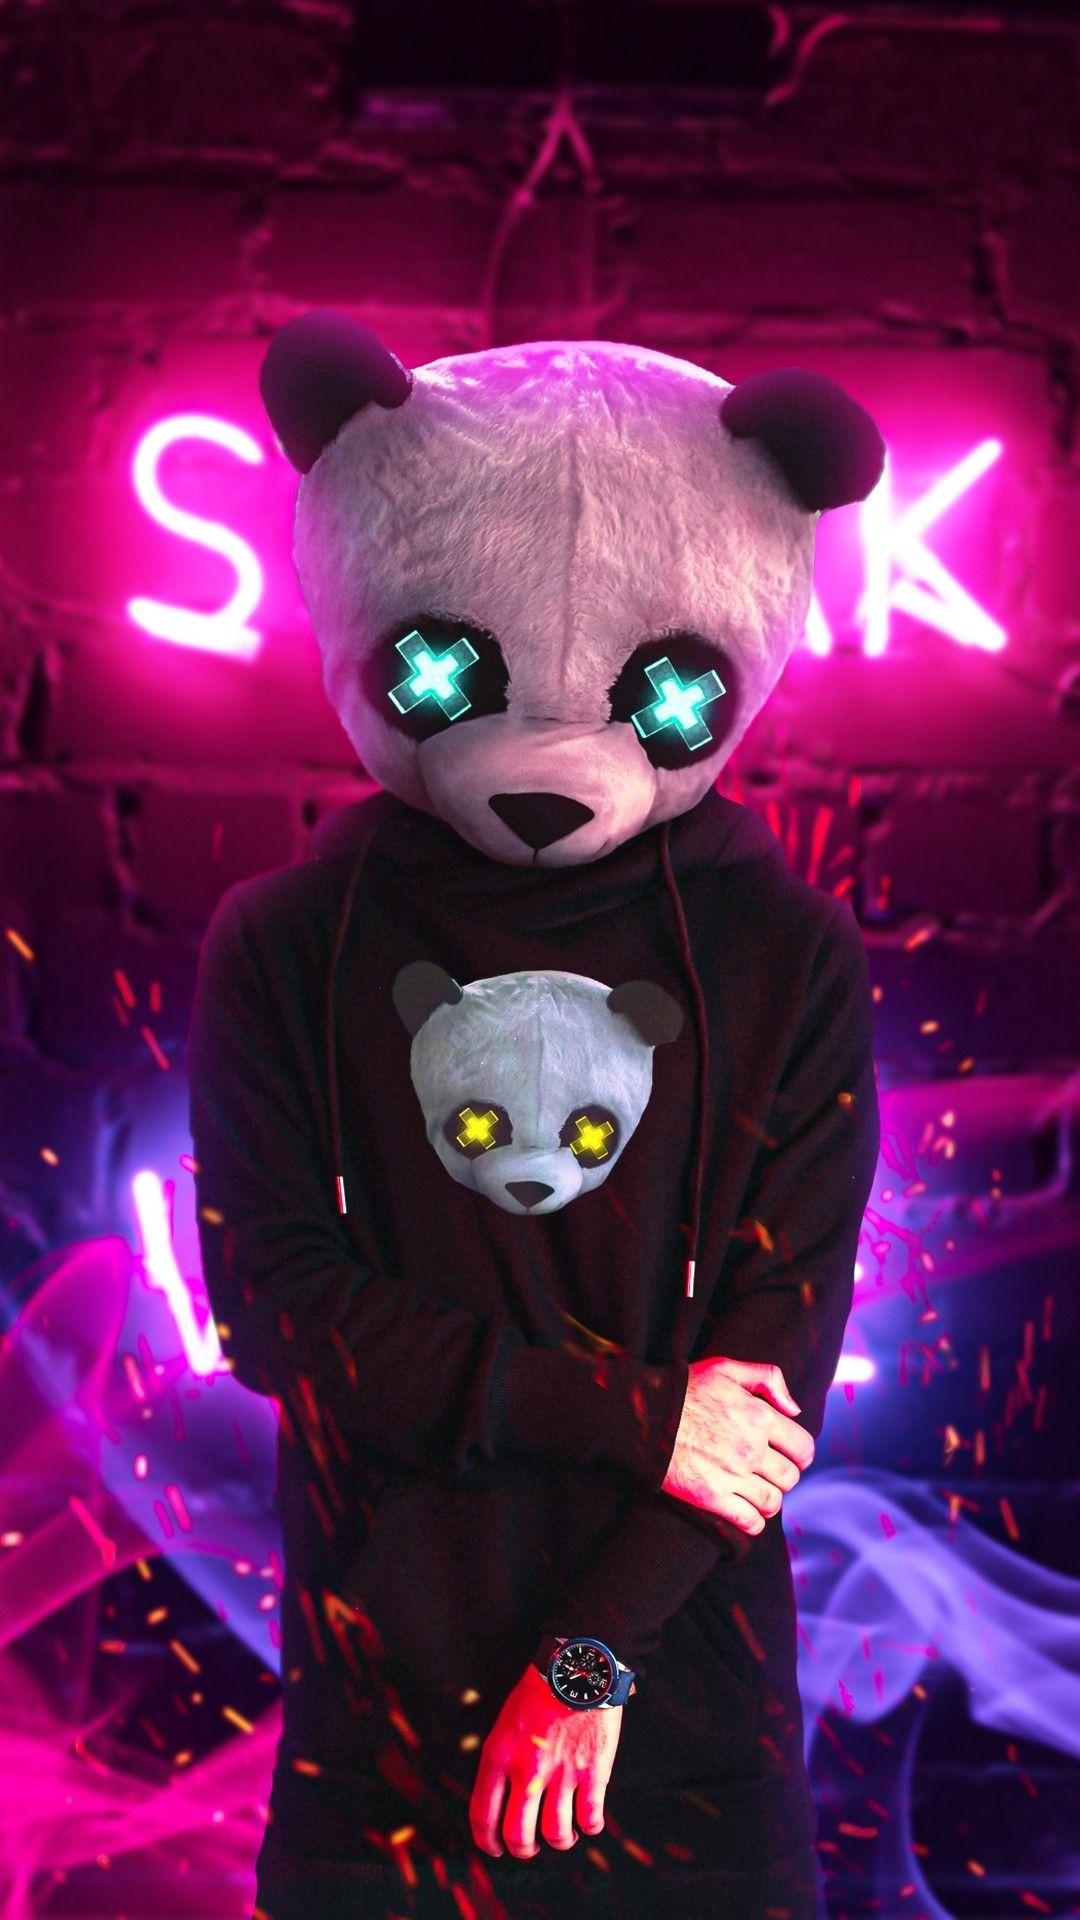 Ambar Bebe In 2020 Cute Panda Wallpaper Panda Art Wallpaper Iphone Neon